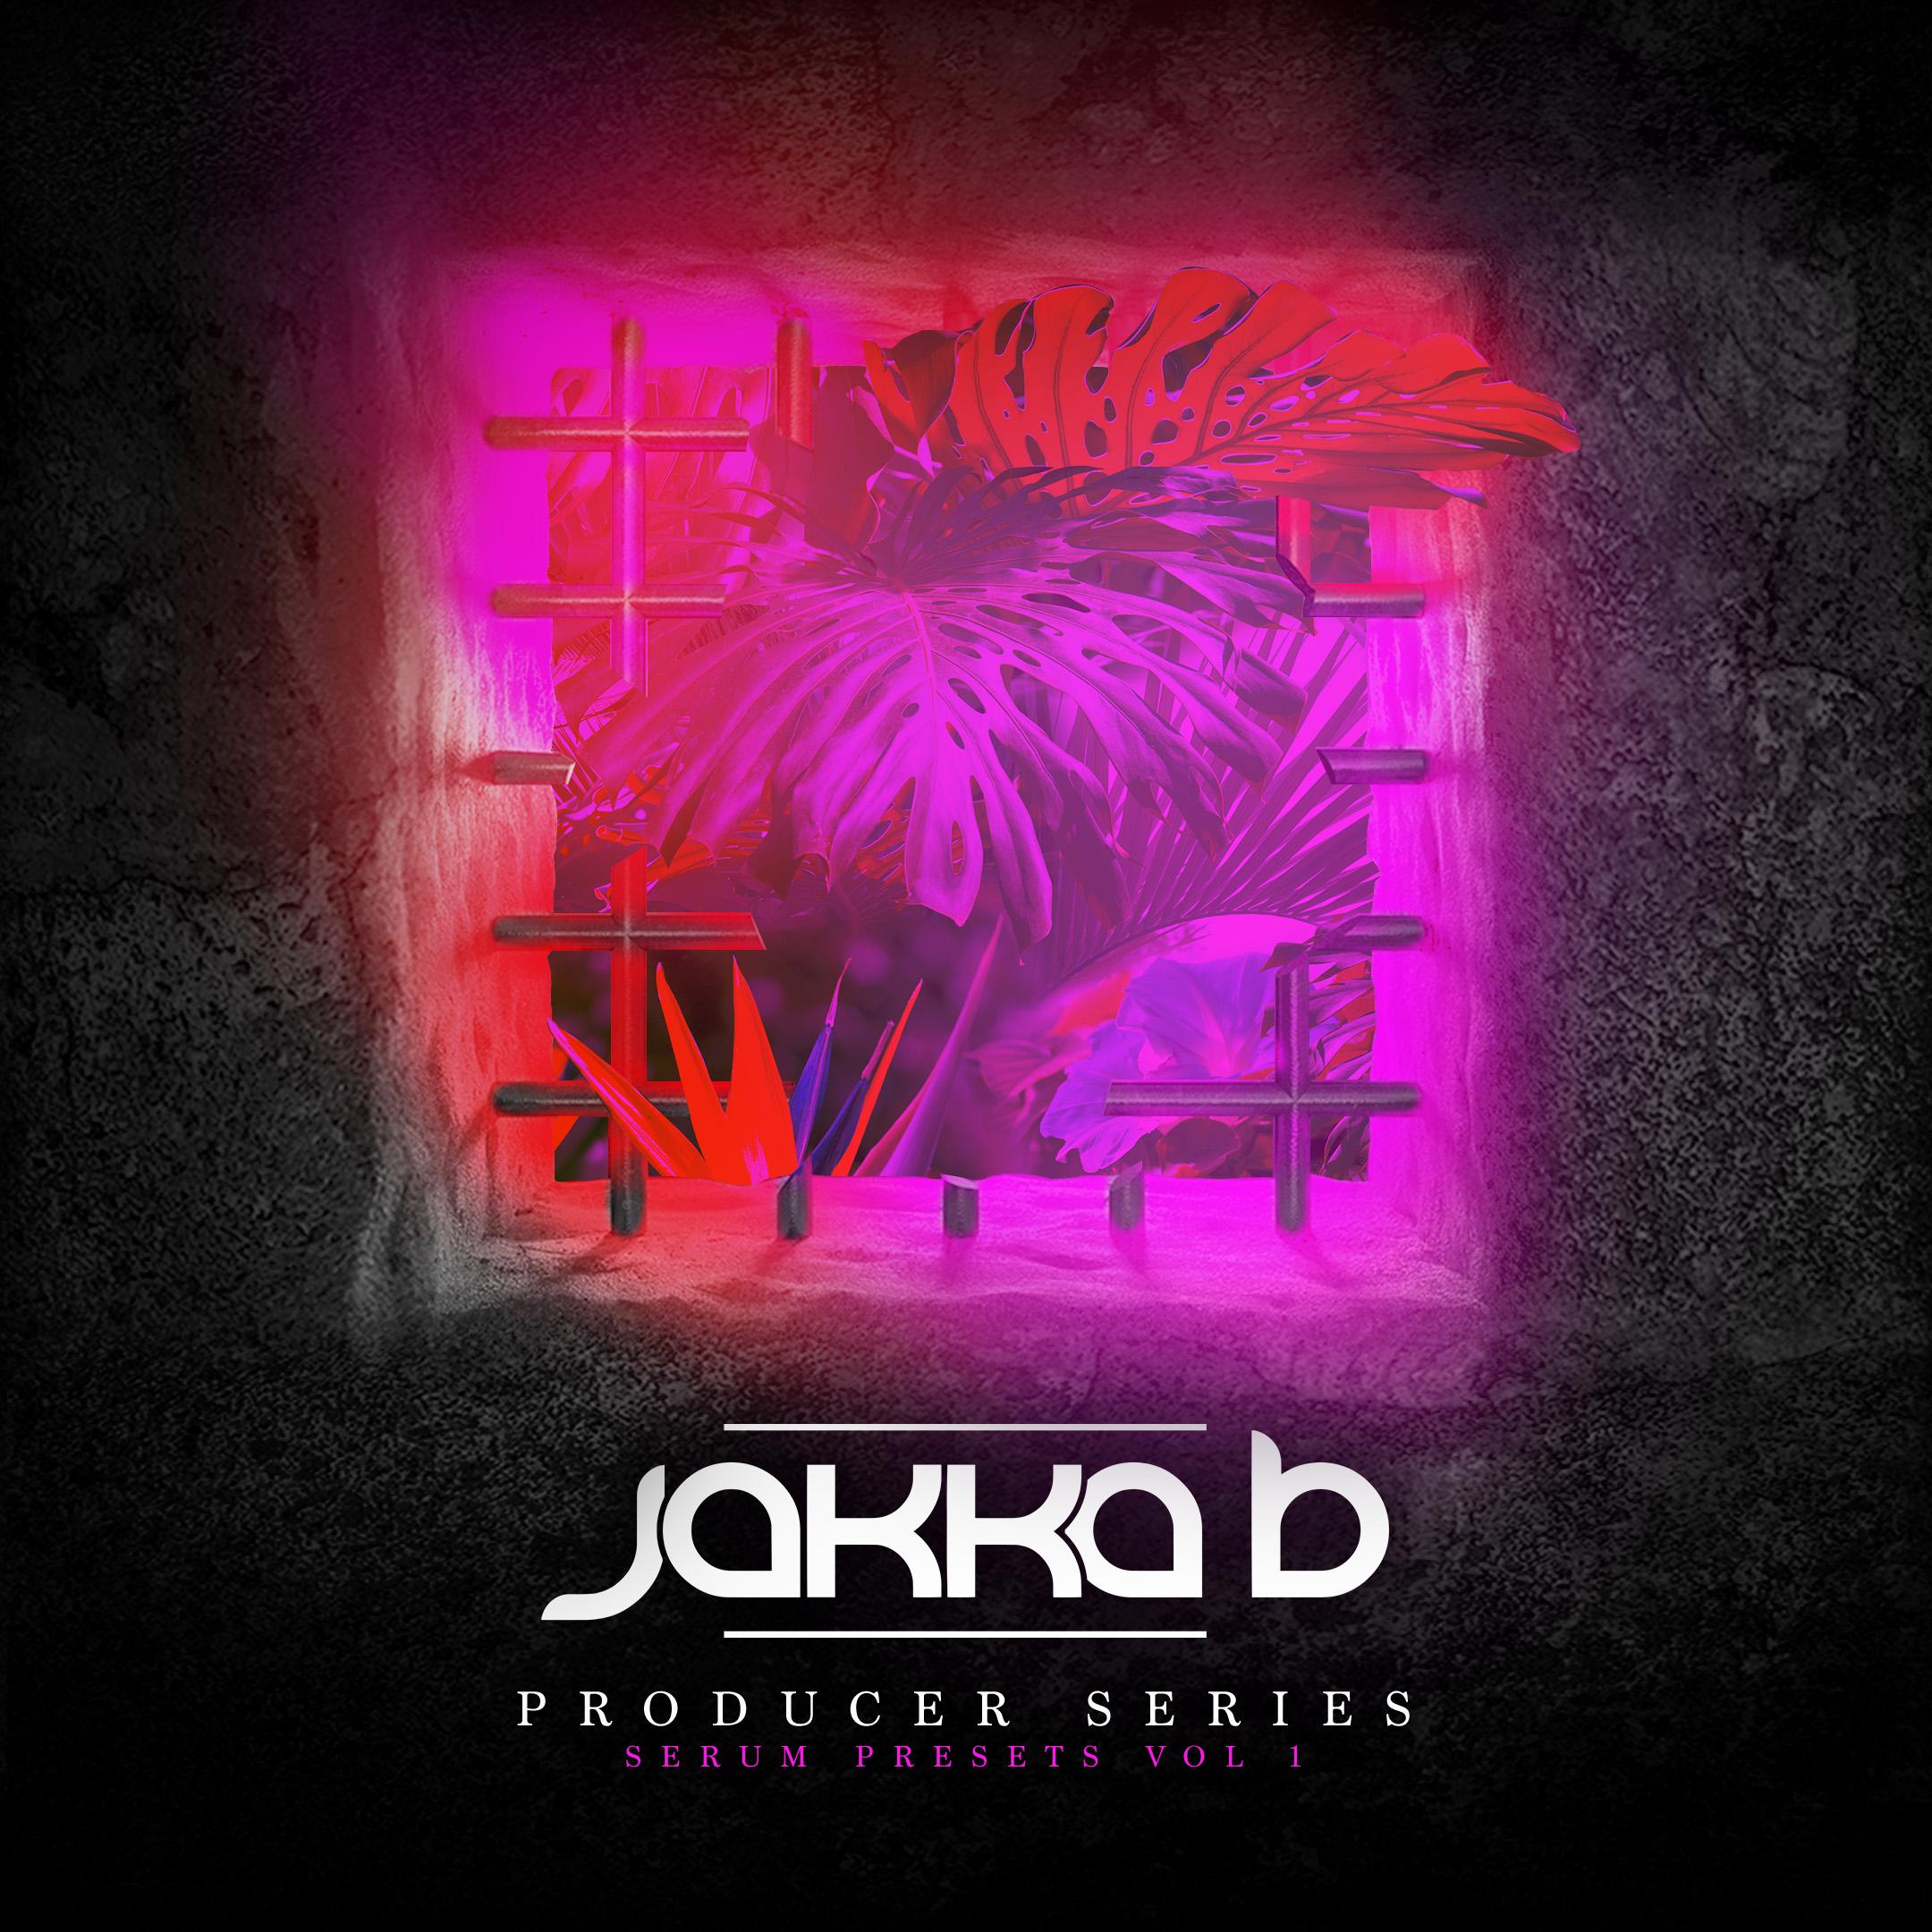 Jakka-B Producer Series